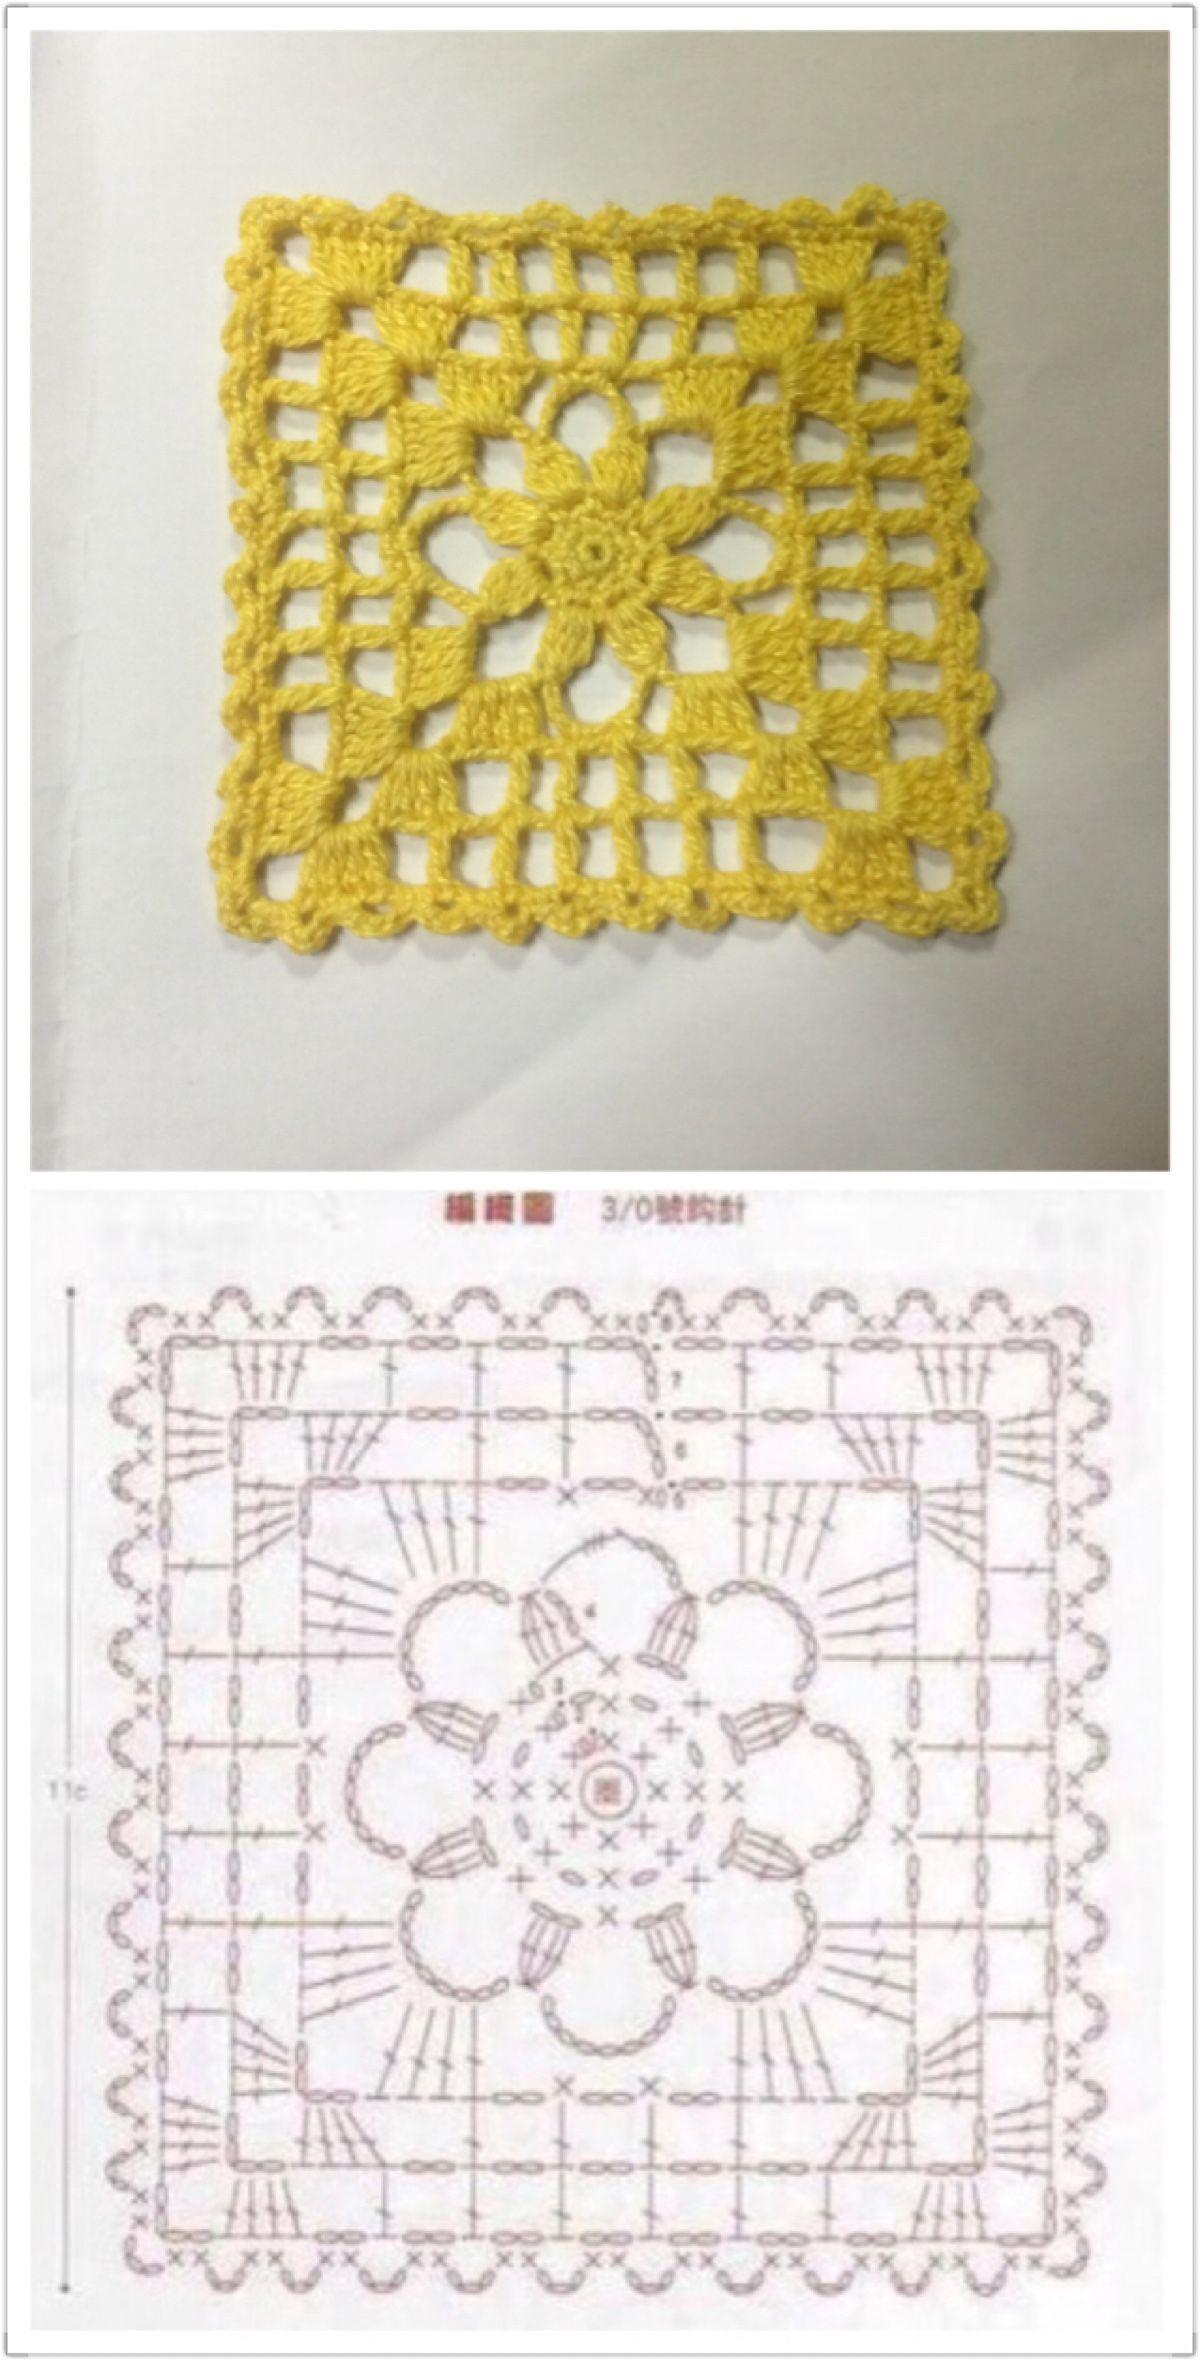 Pin de Asuka Kai en かぎ針編み ブランケット | Pinterest | Ganchillo ...